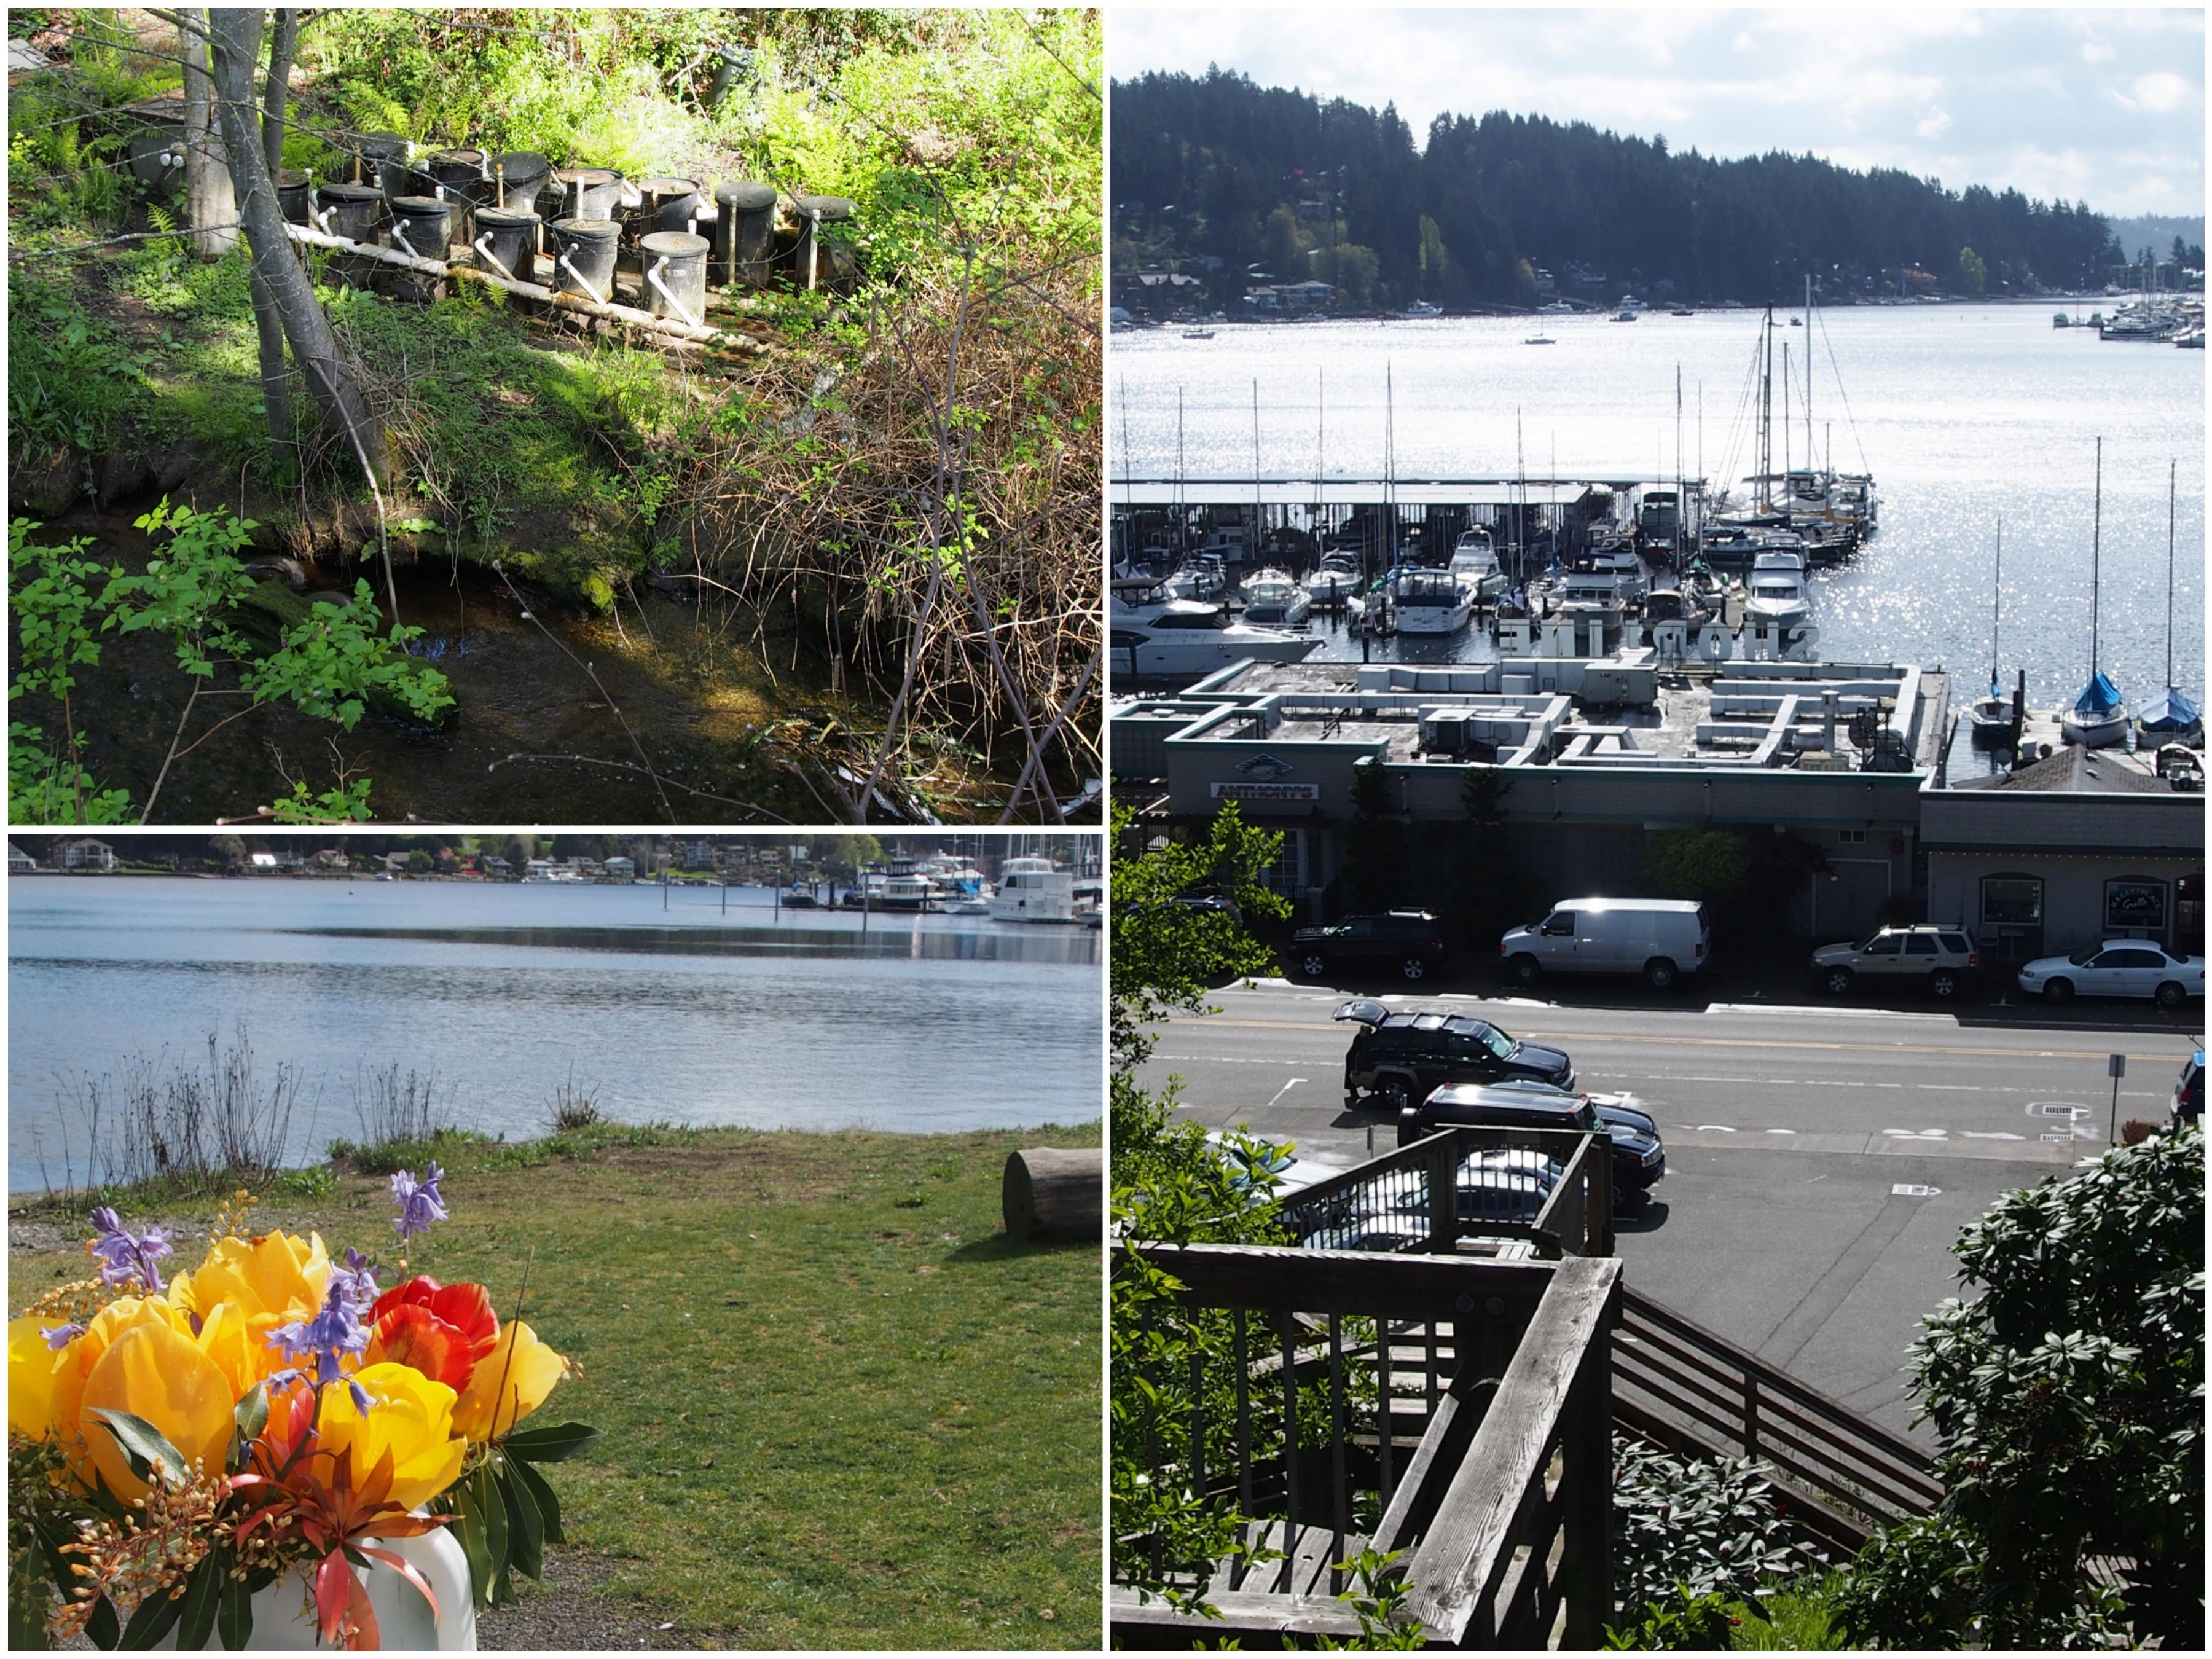 Skiffs To Spirits Top 5 Reasons To Visit Gig Harbor